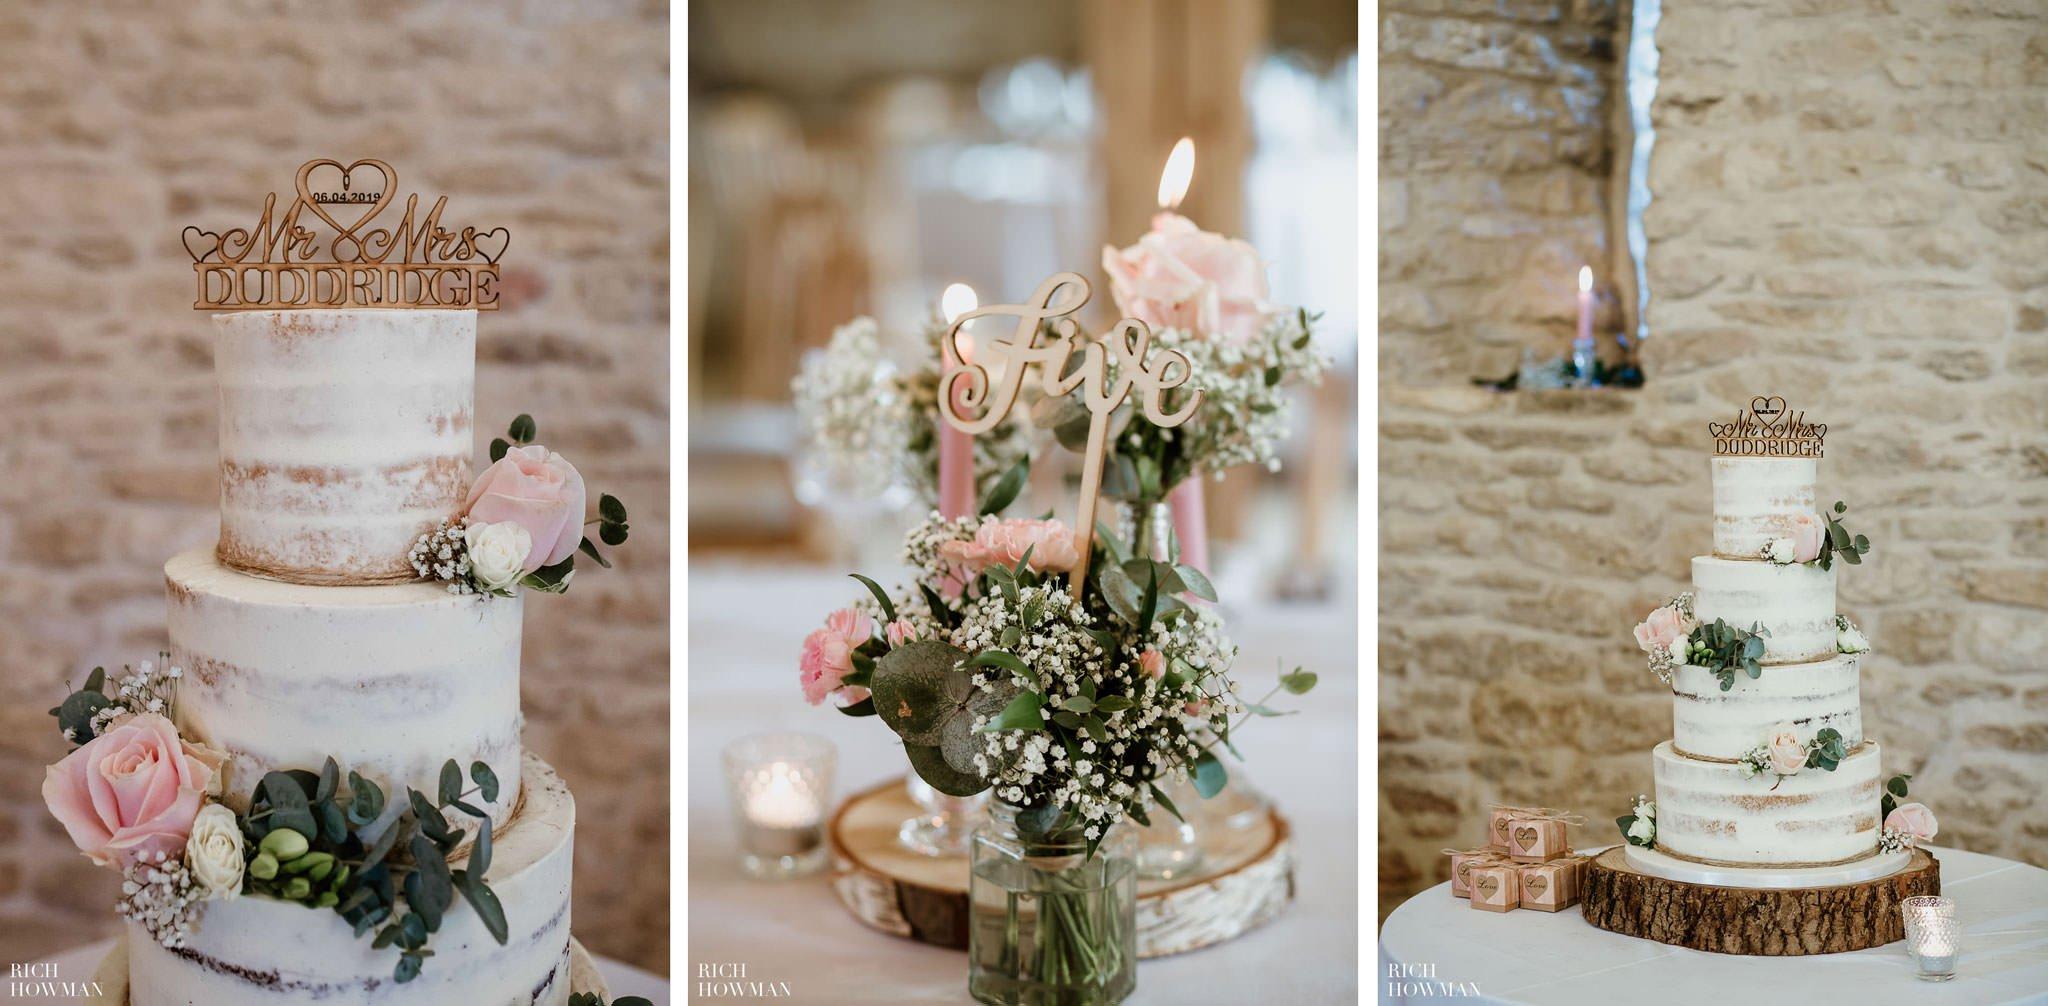 Kingscote Barn Wedding Photographer 35